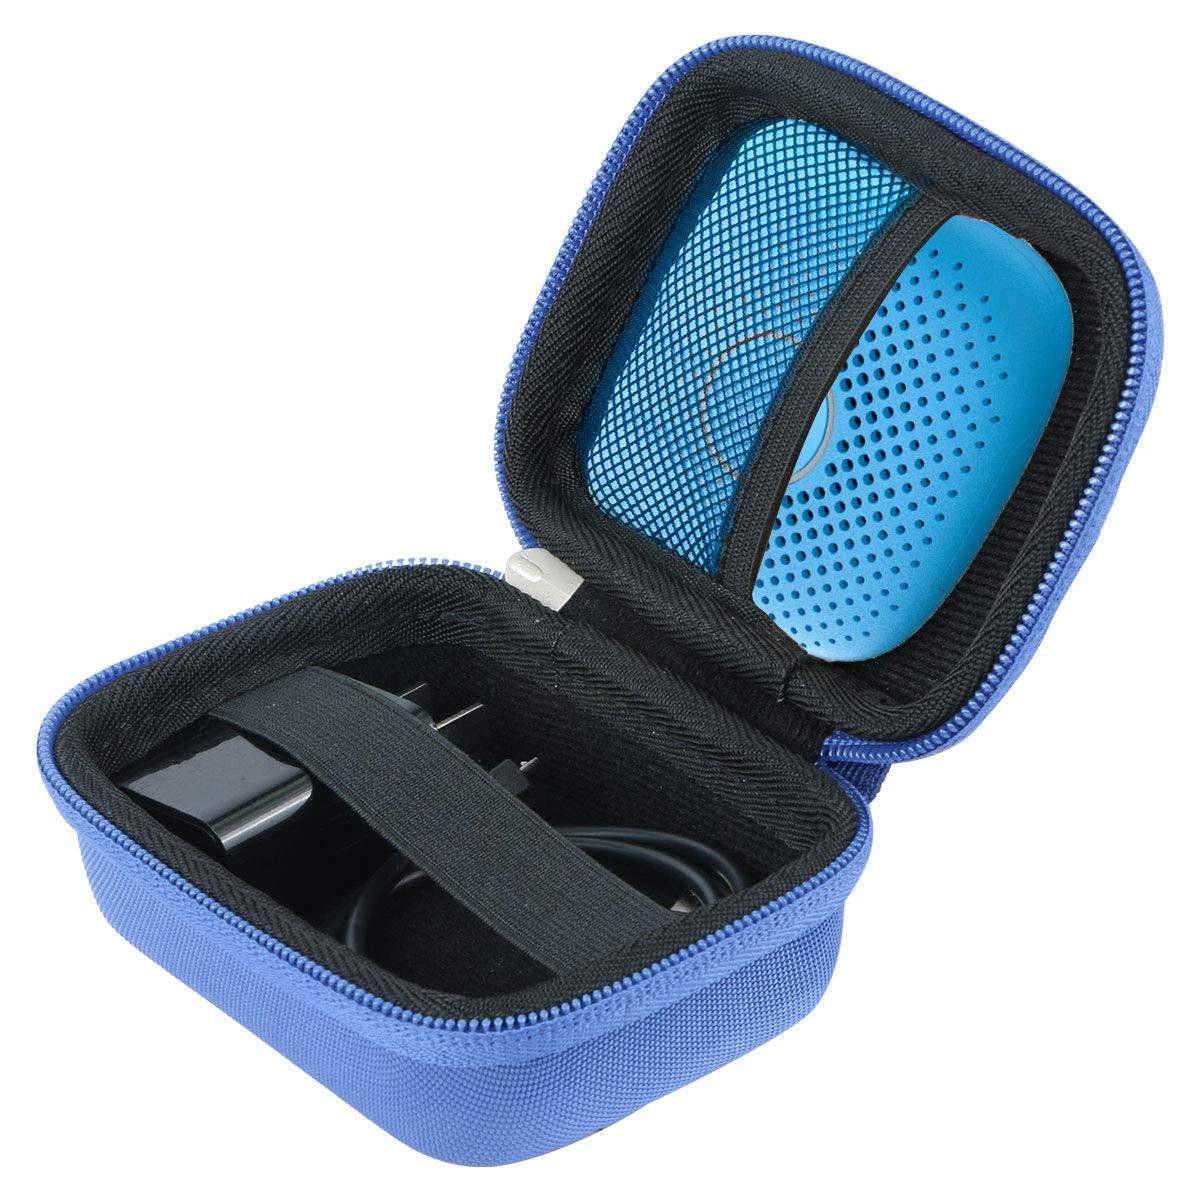 khanka Hard Travel Case Replacement for Relay Kids Phone Alternative: A Screen-Free Smarter Phone by khanka